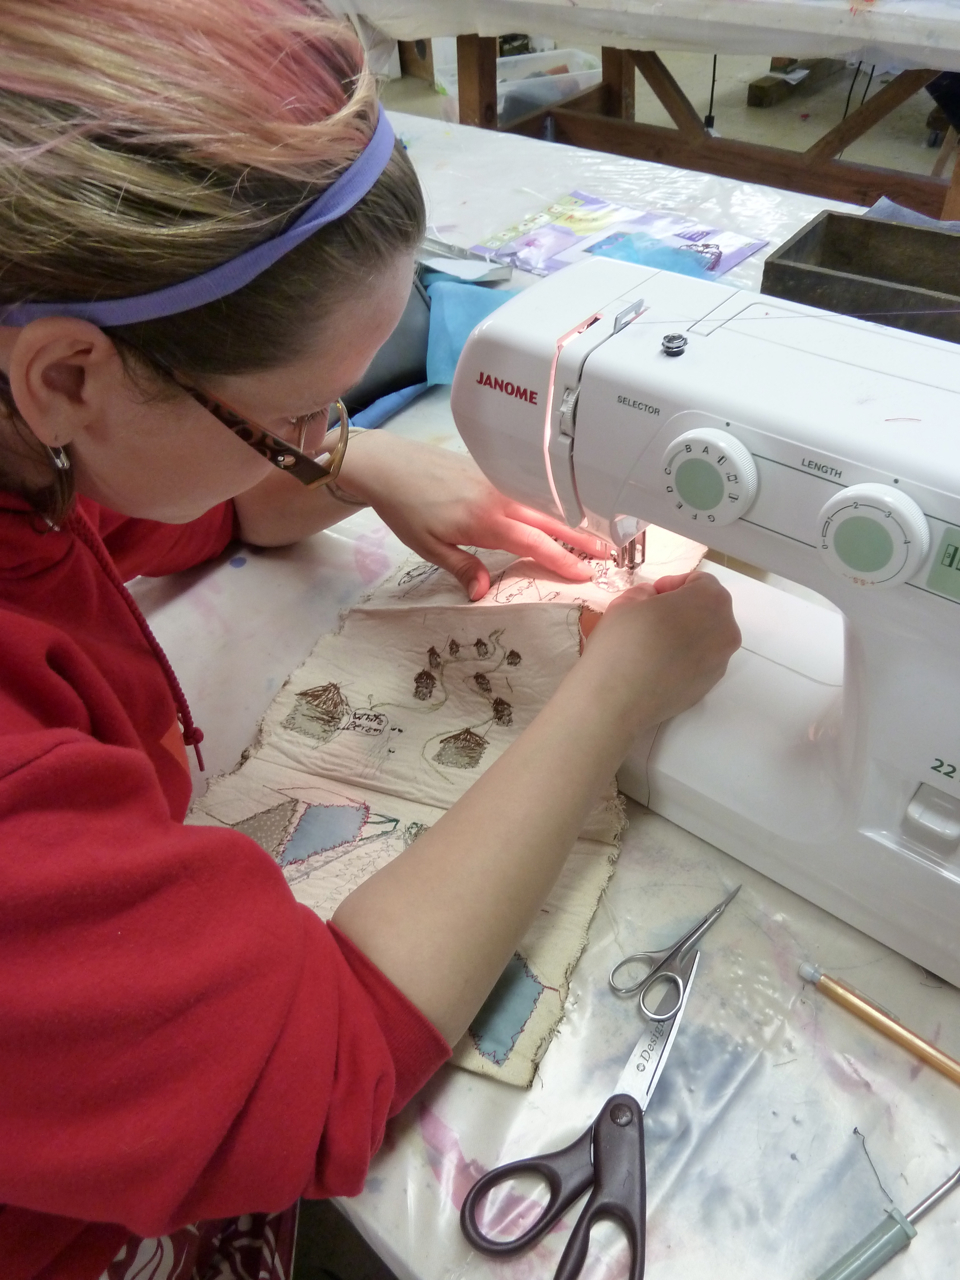 Sketching using the Sewing Machine